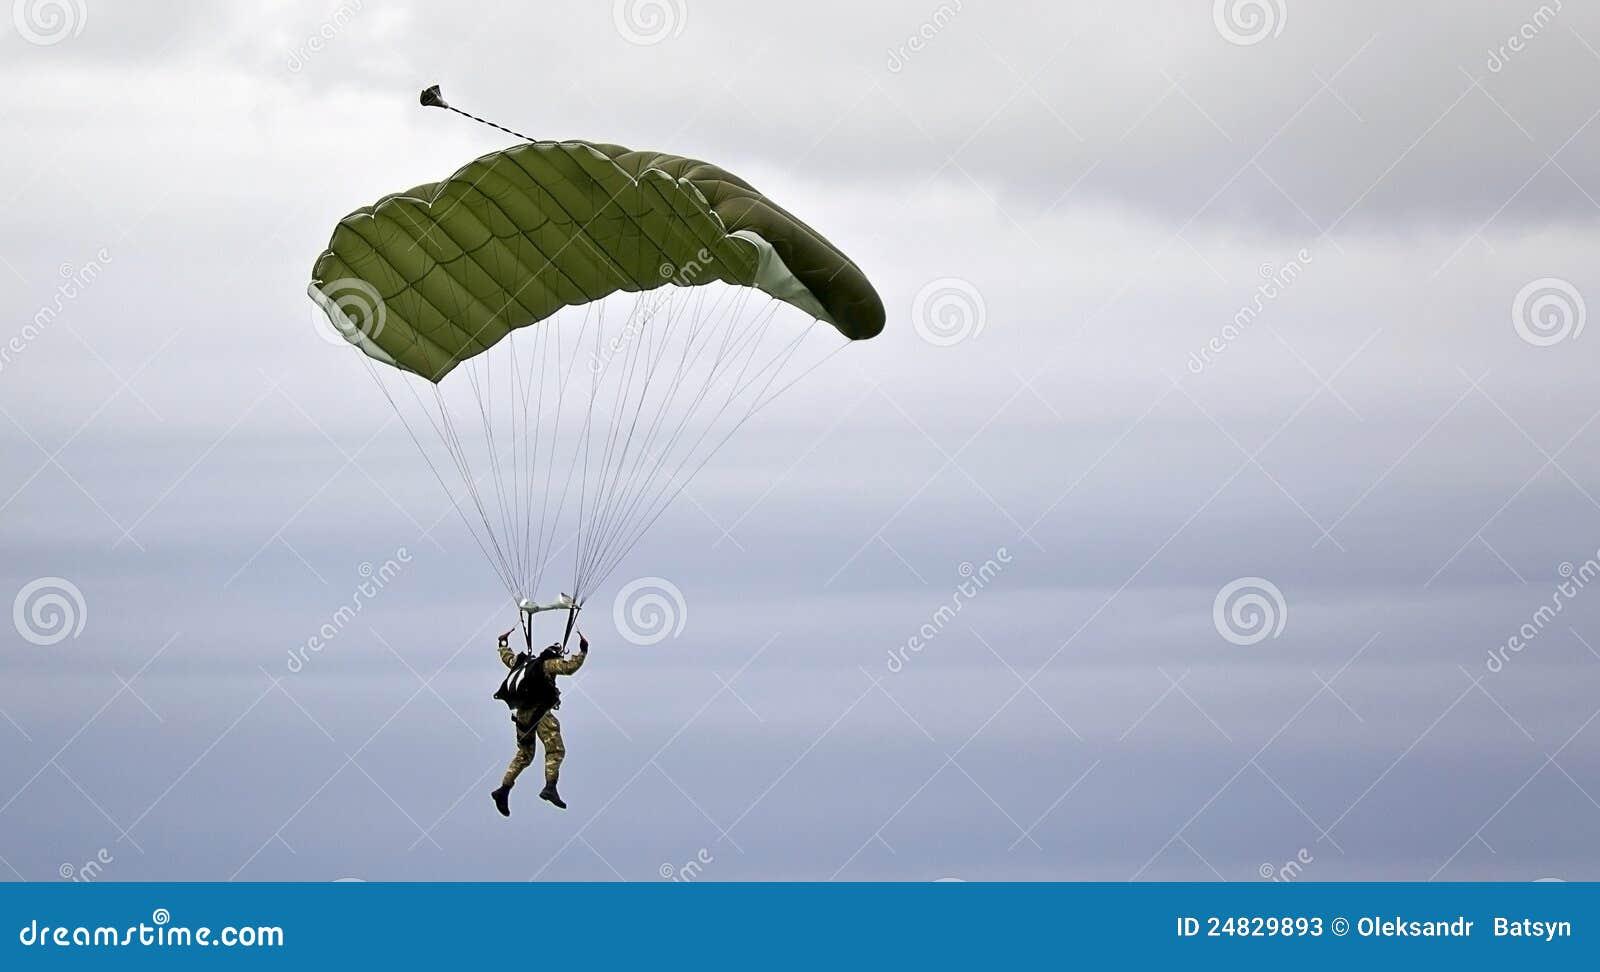 Militarny parachutist